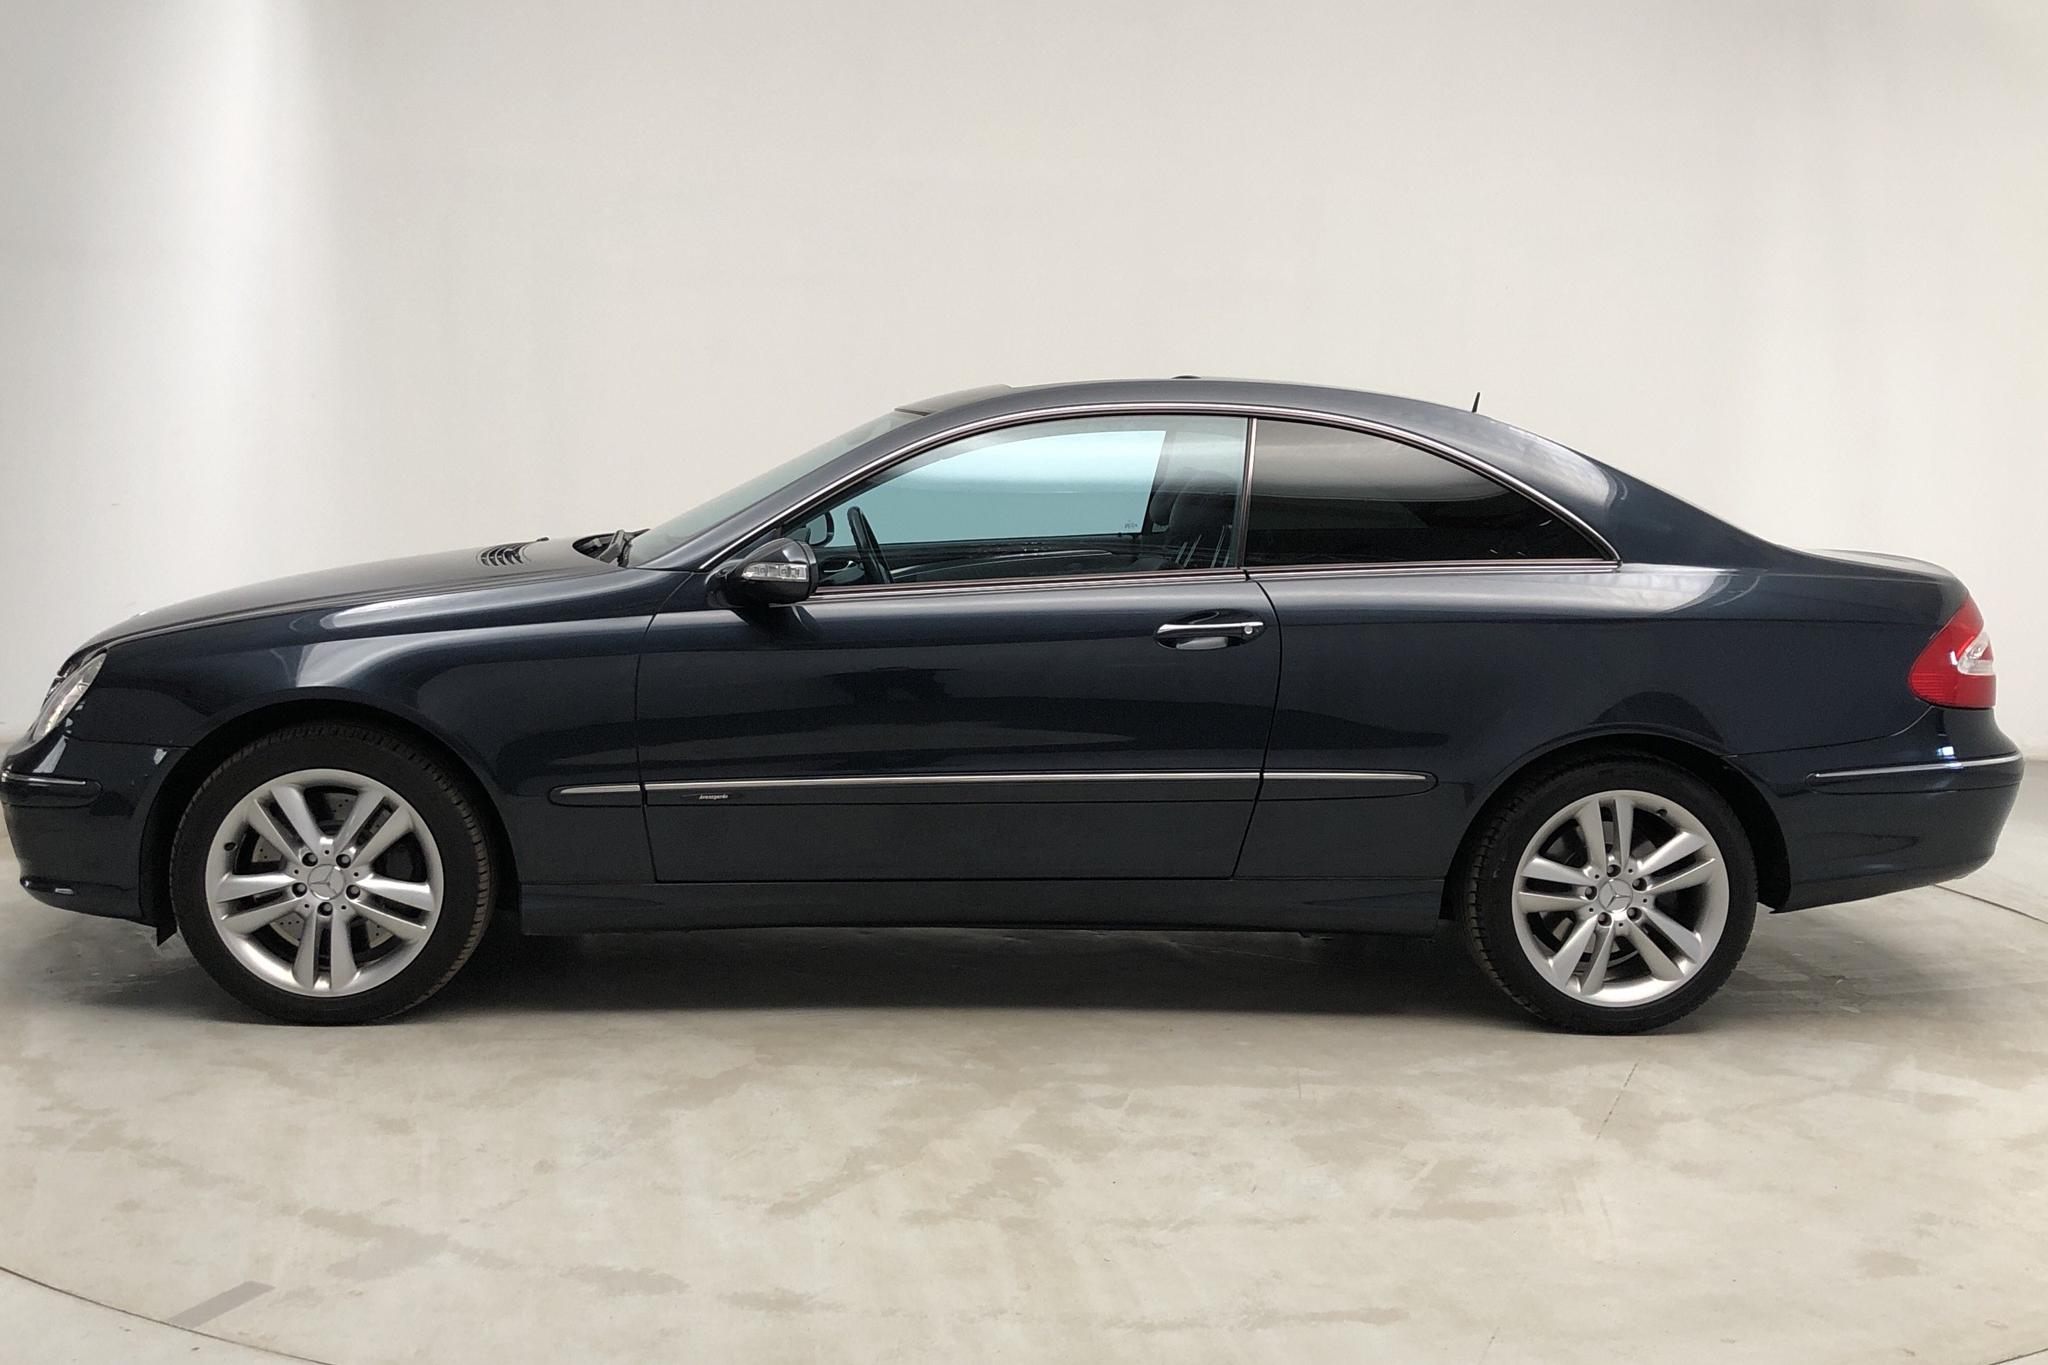 Mercedes CLK 500 C209 (306hk) - 143 920 km - Automatic - black - 2003